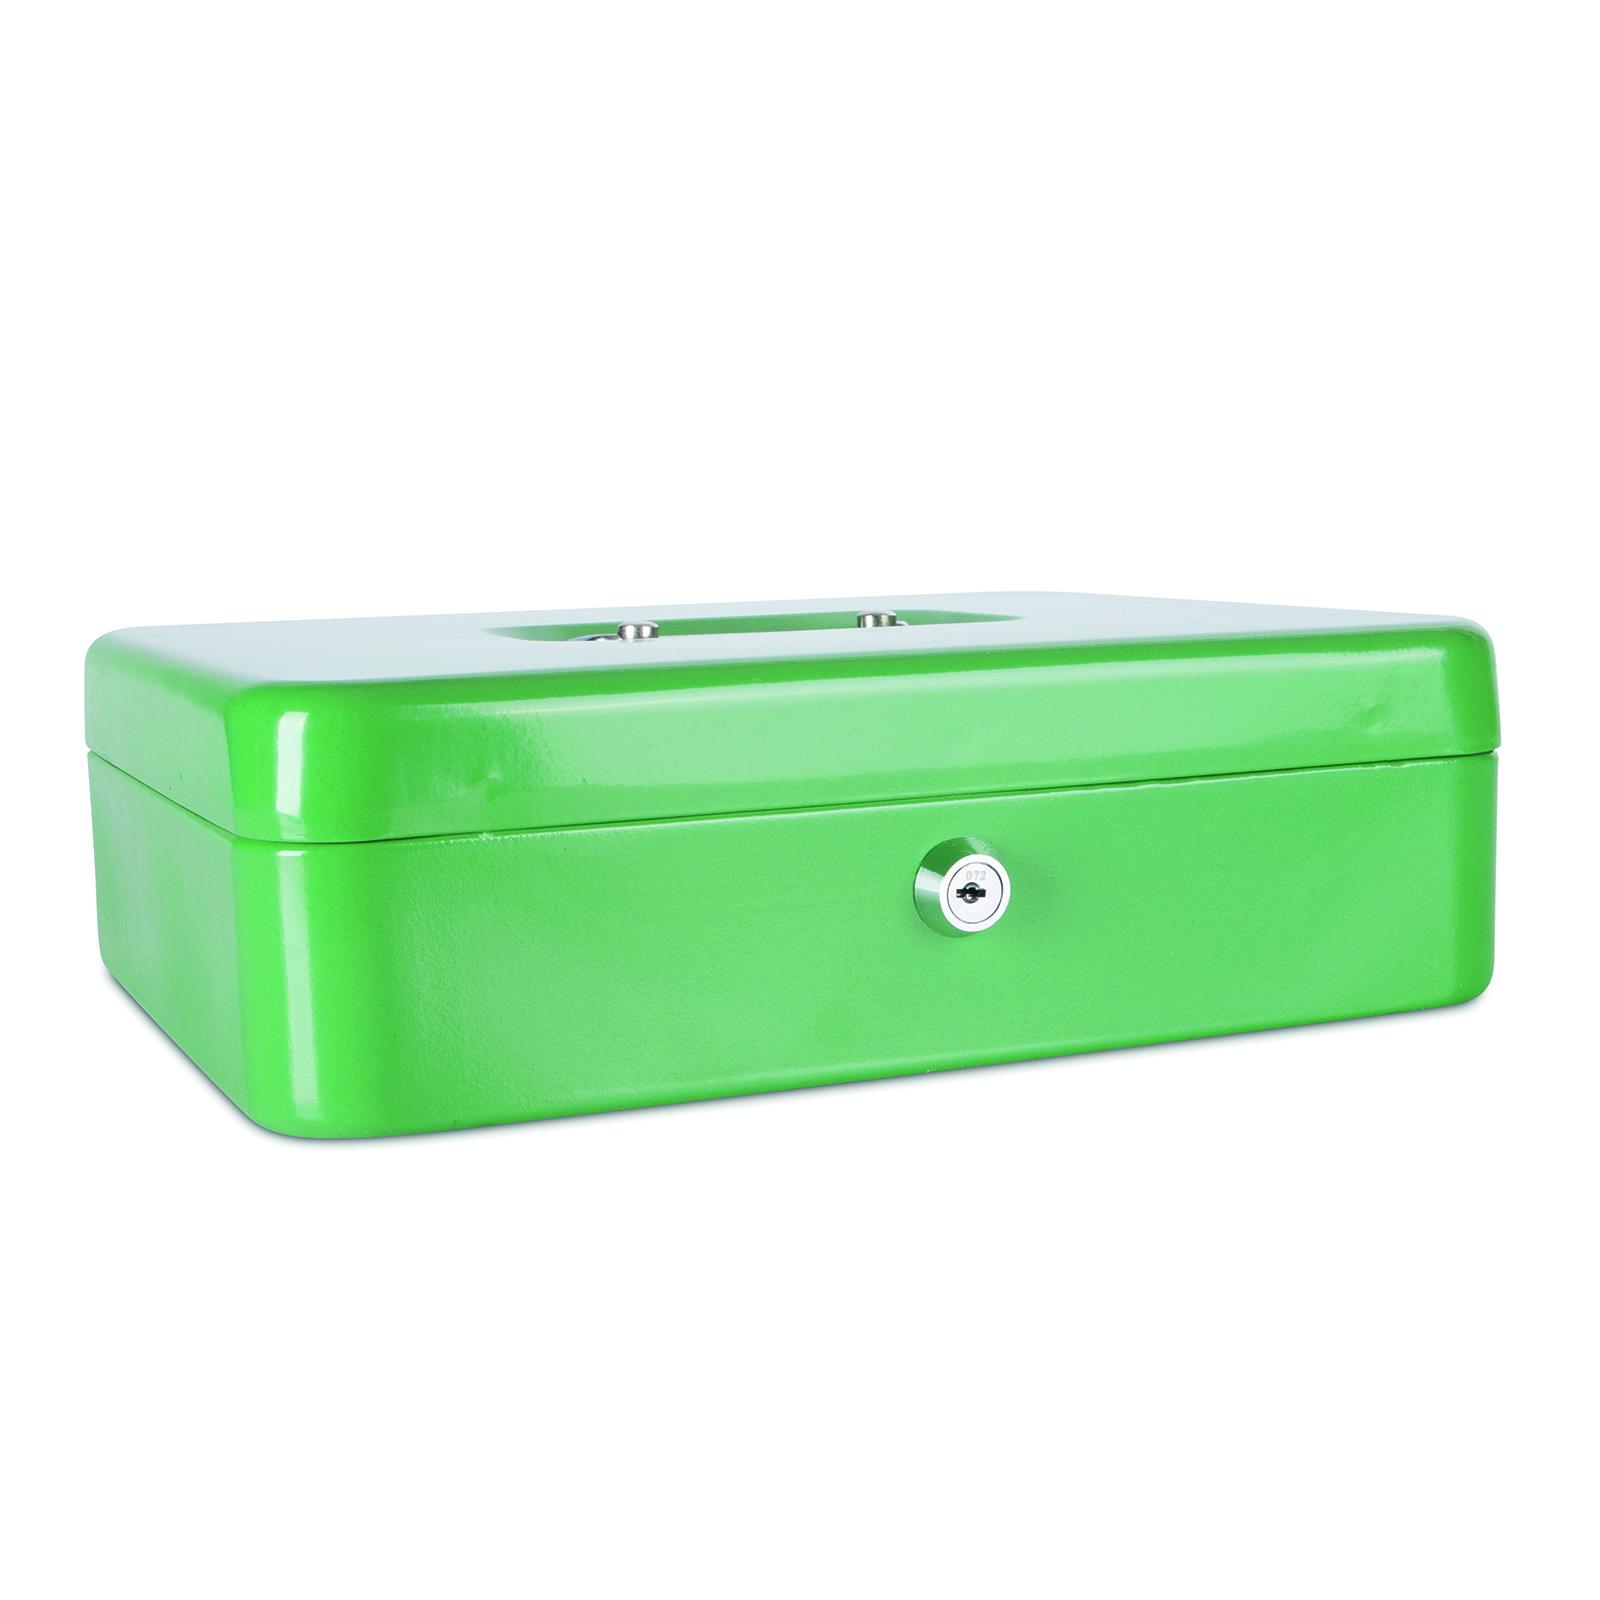 Imagens de #668843 Cash Box DONAU extra large 300x90x240mm green PBS Connect Polska  1600x1600 px 3180 Box Banheiro 90 X 90